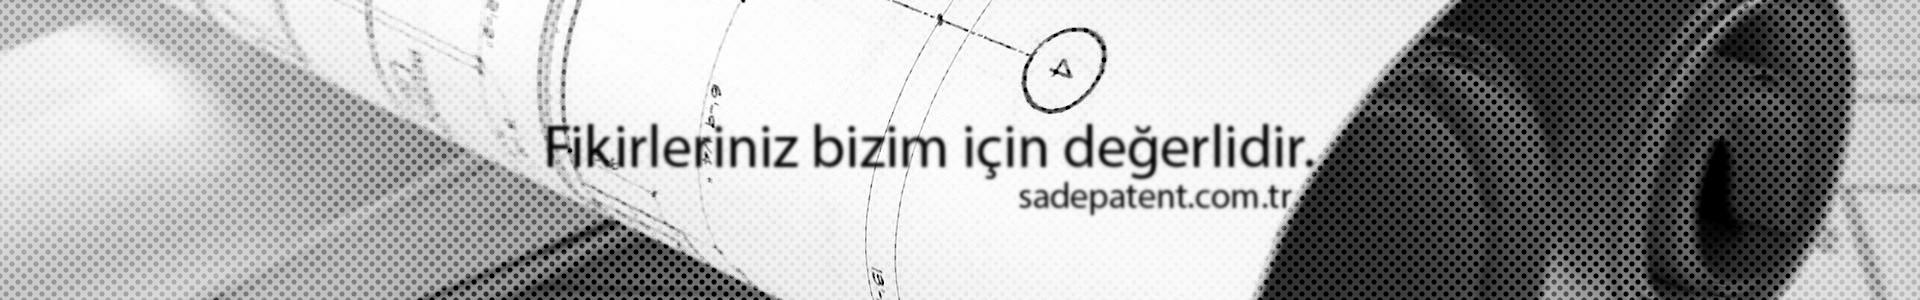 Sade Patent – Marka tescil, patent-Banner